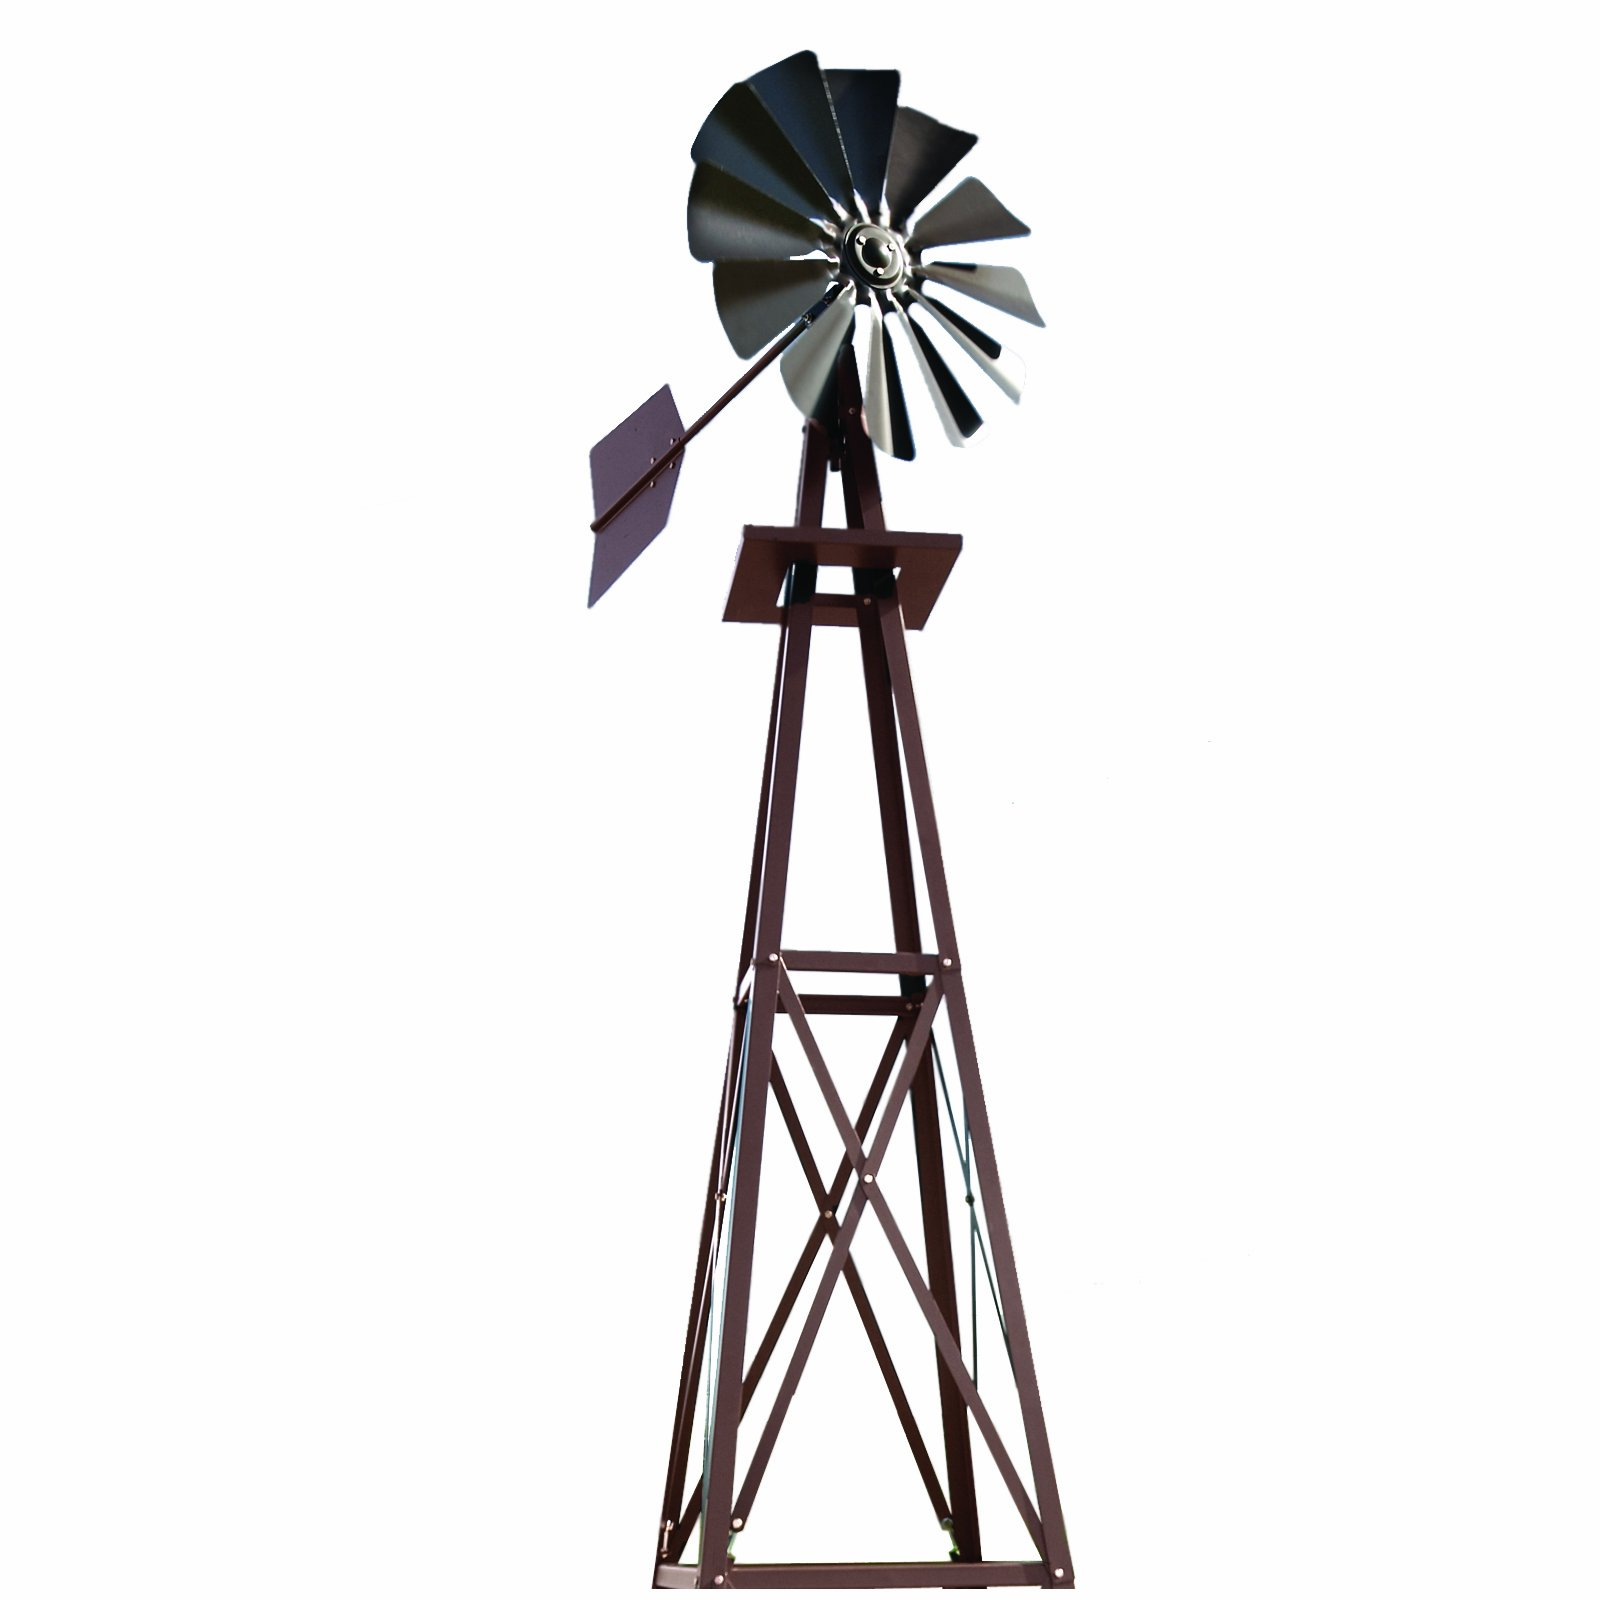 Outdoor Water Solutions 9-Foot Bronze Powder Coated Backyard Windmill